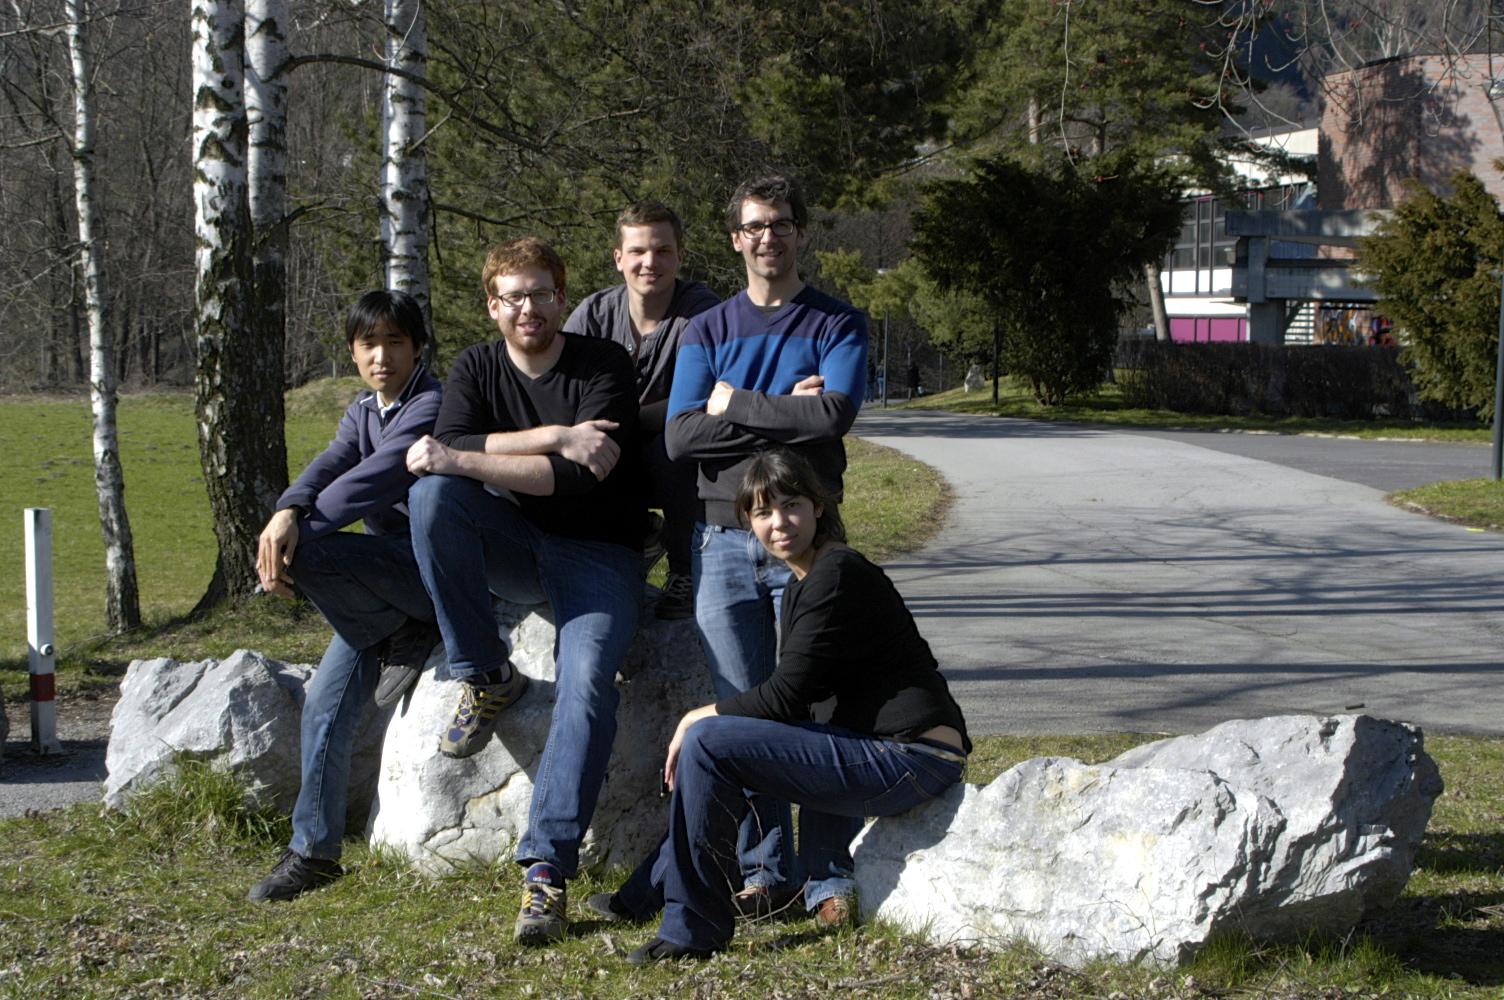 ERBIUM TEAM (2012) Left to right: Kiyotaka, Albert, Simon, Michael, Francesca